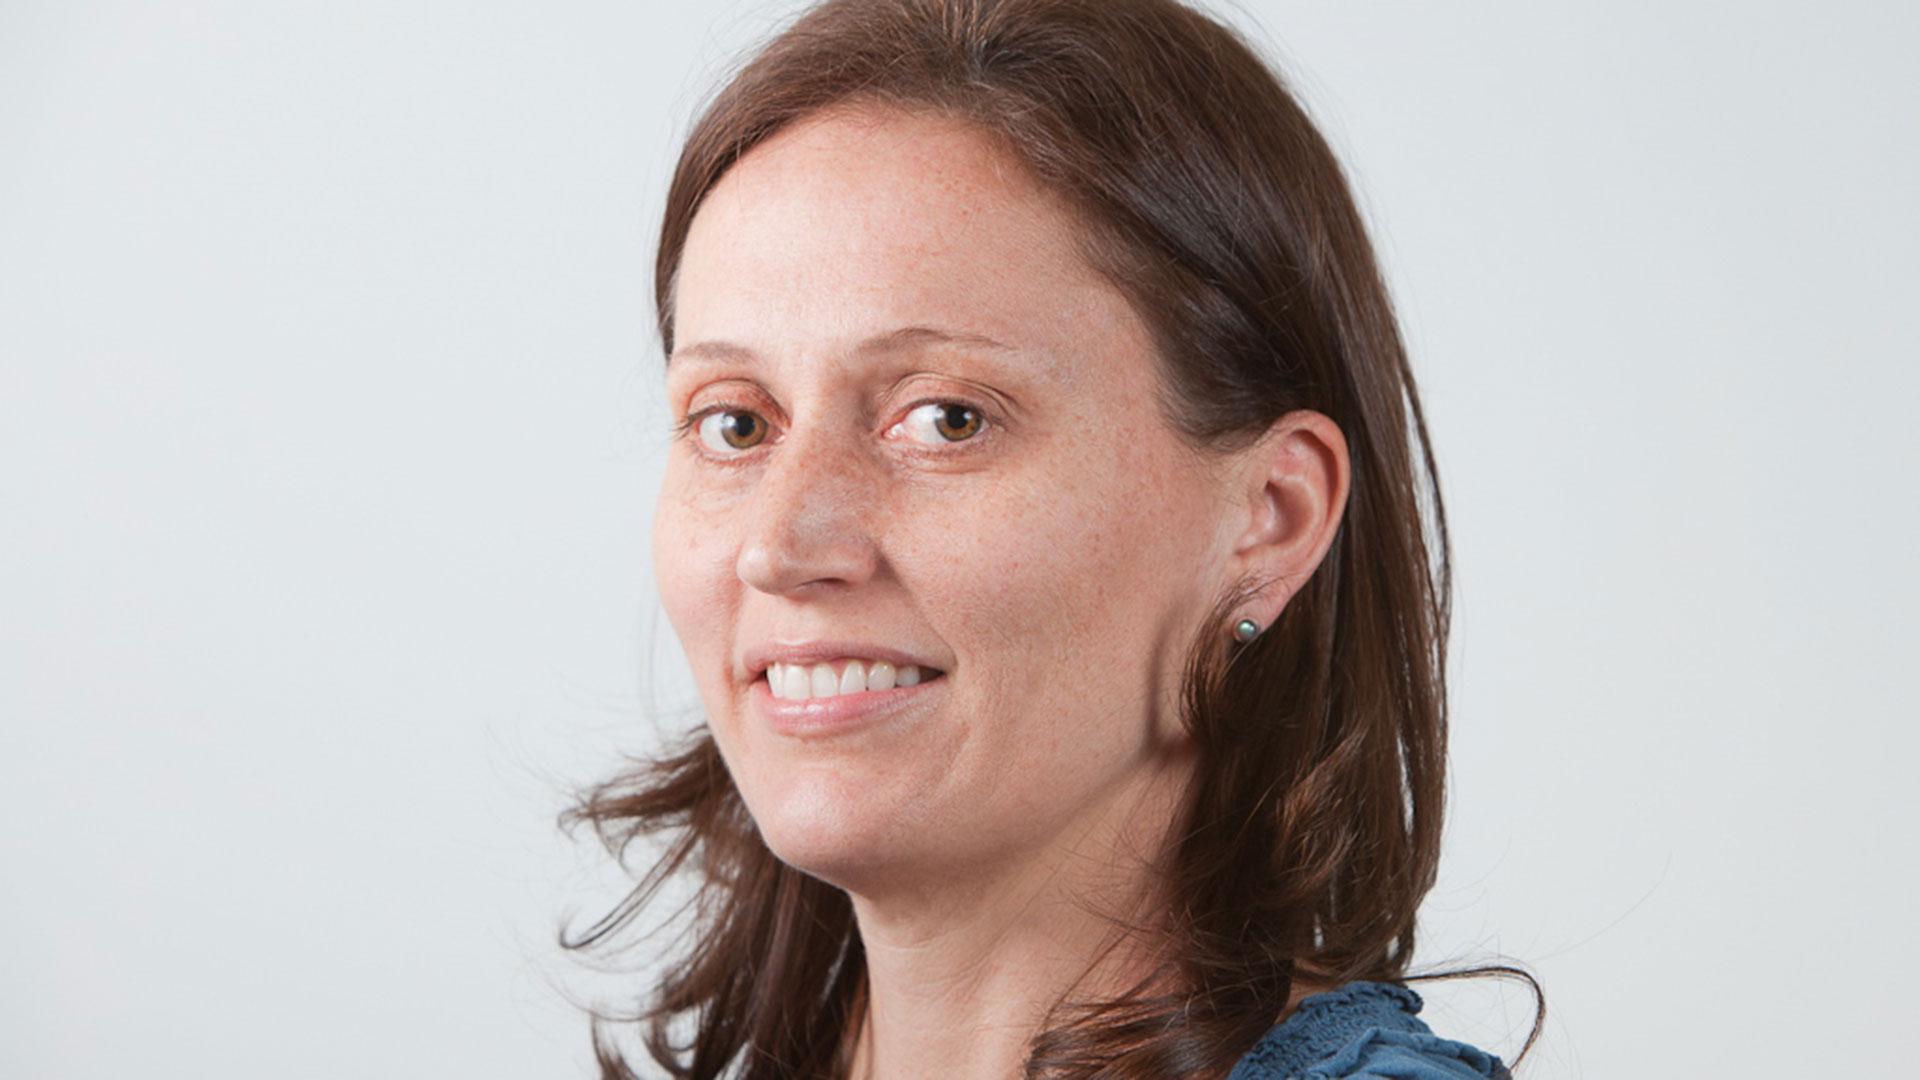 Headshot of All of Me filmmaker Alexandra Lescaze